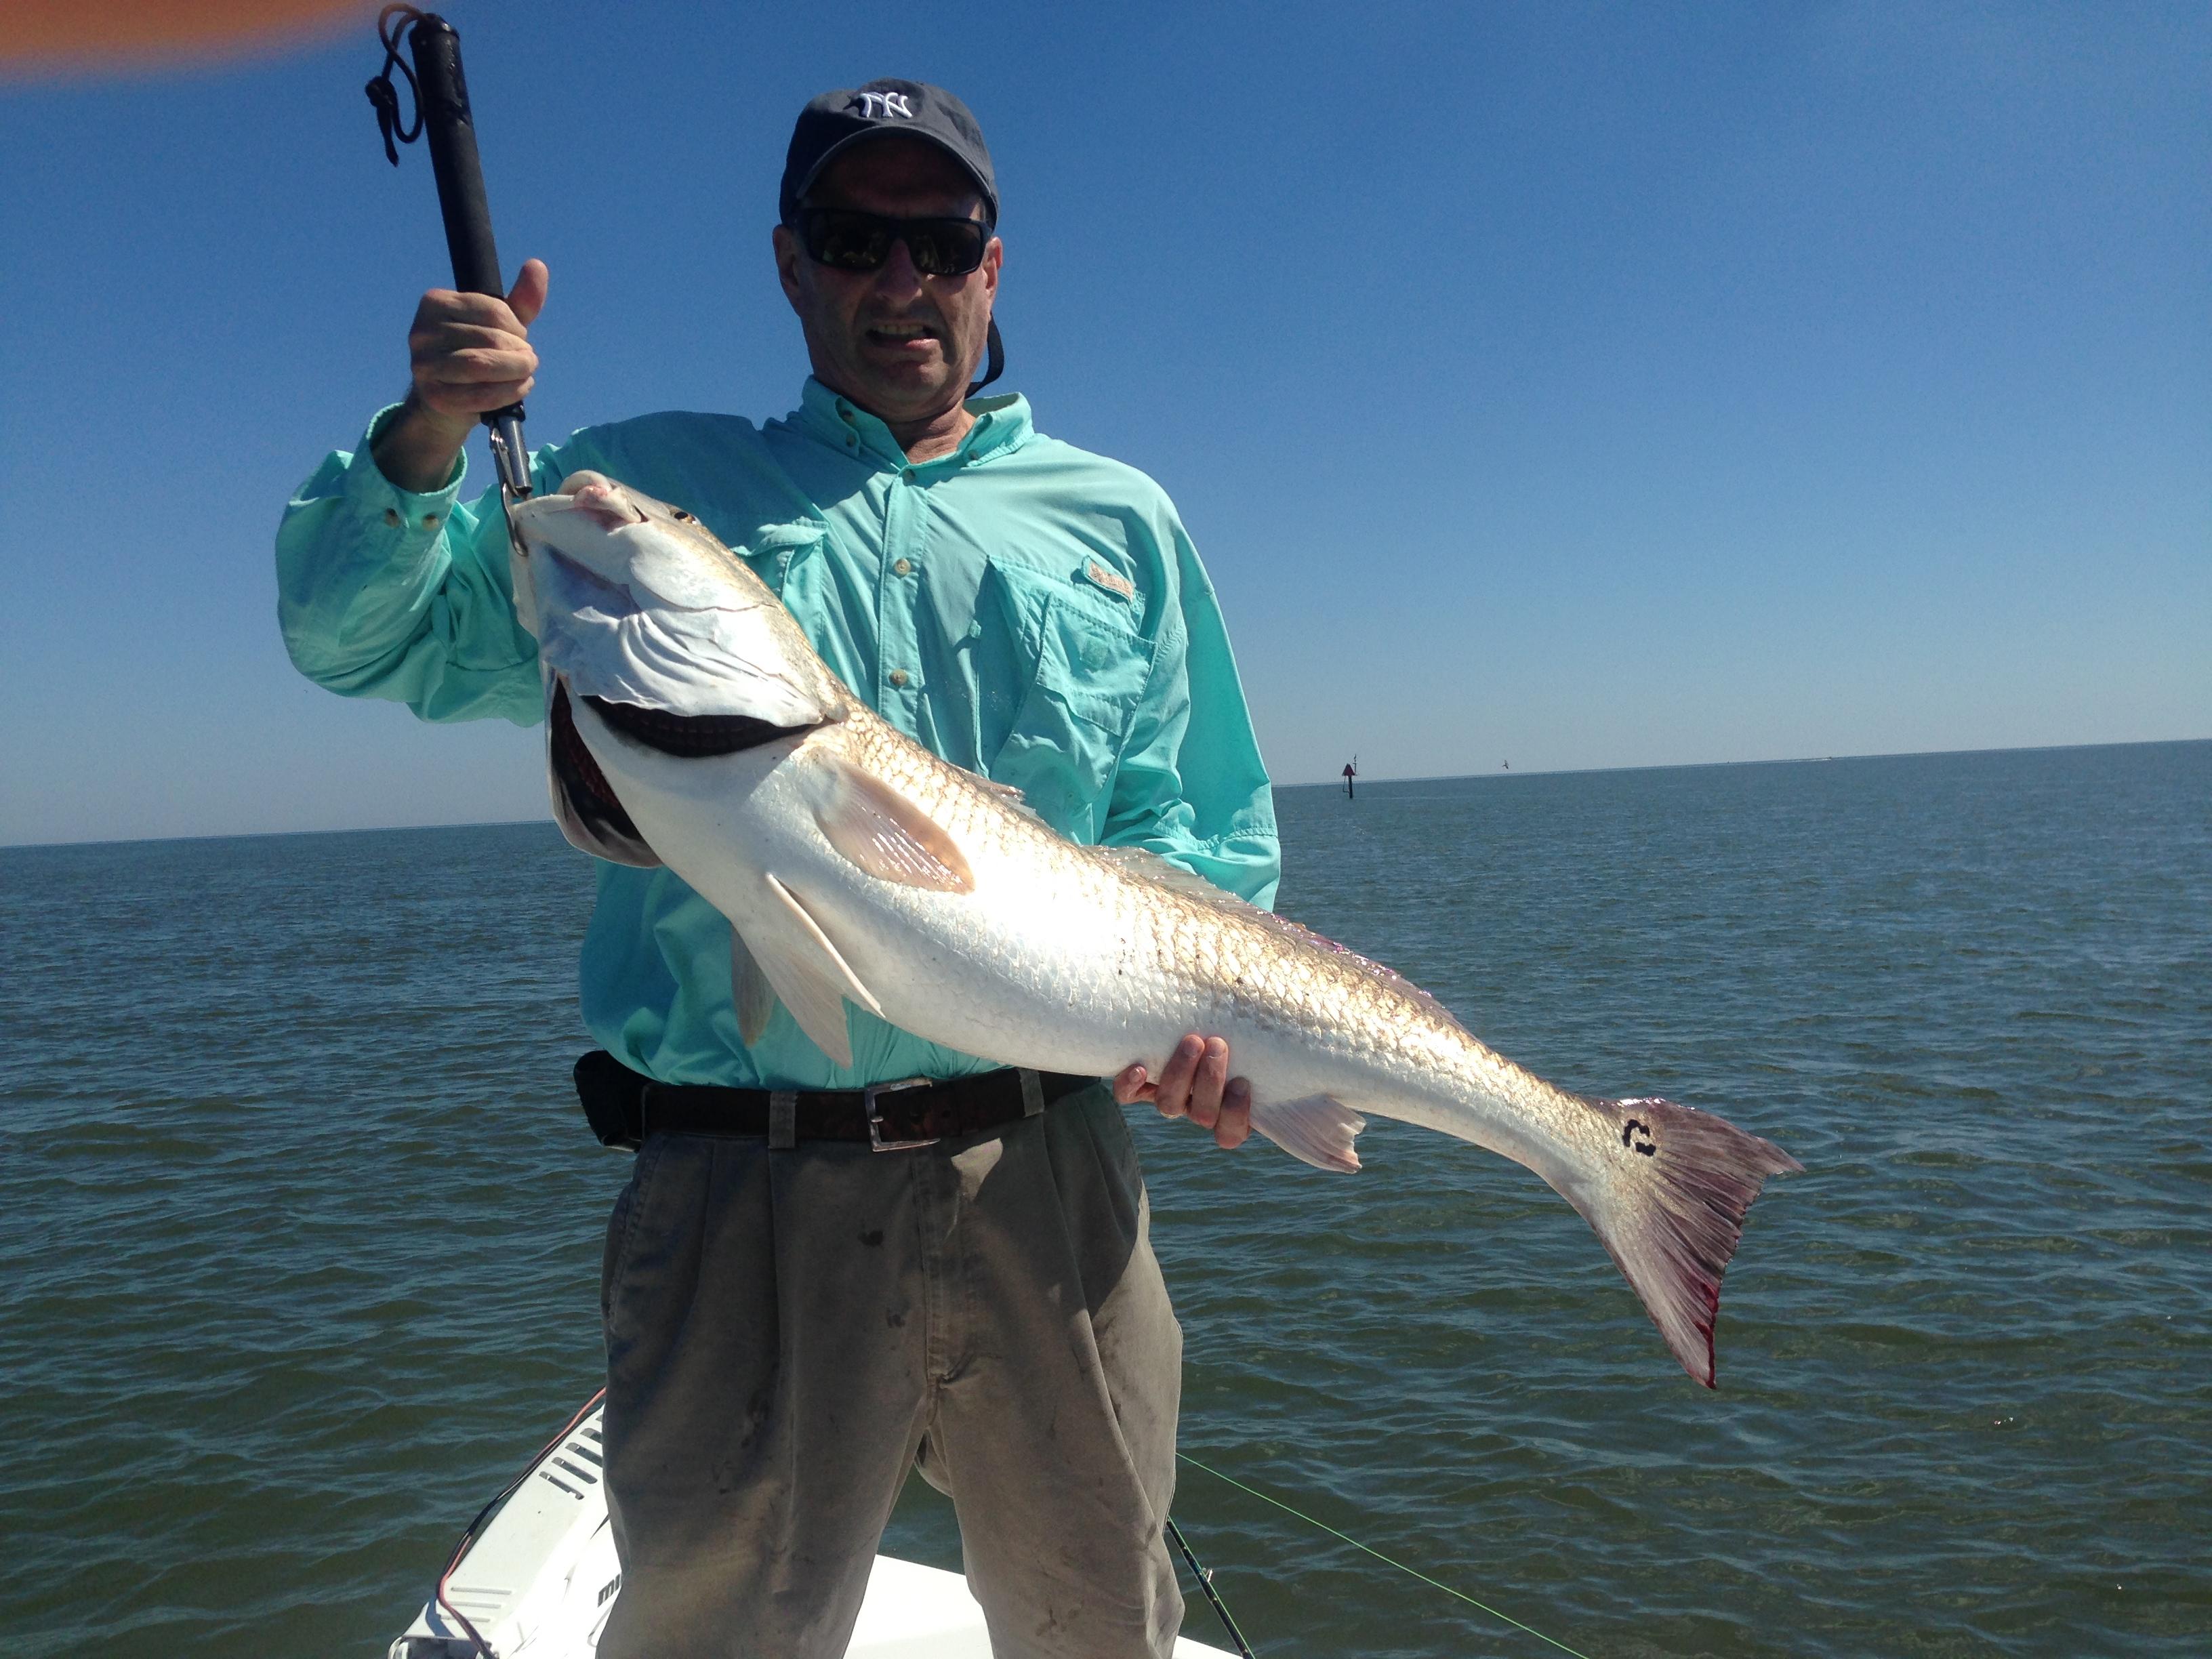 Steve Novack with Big Red